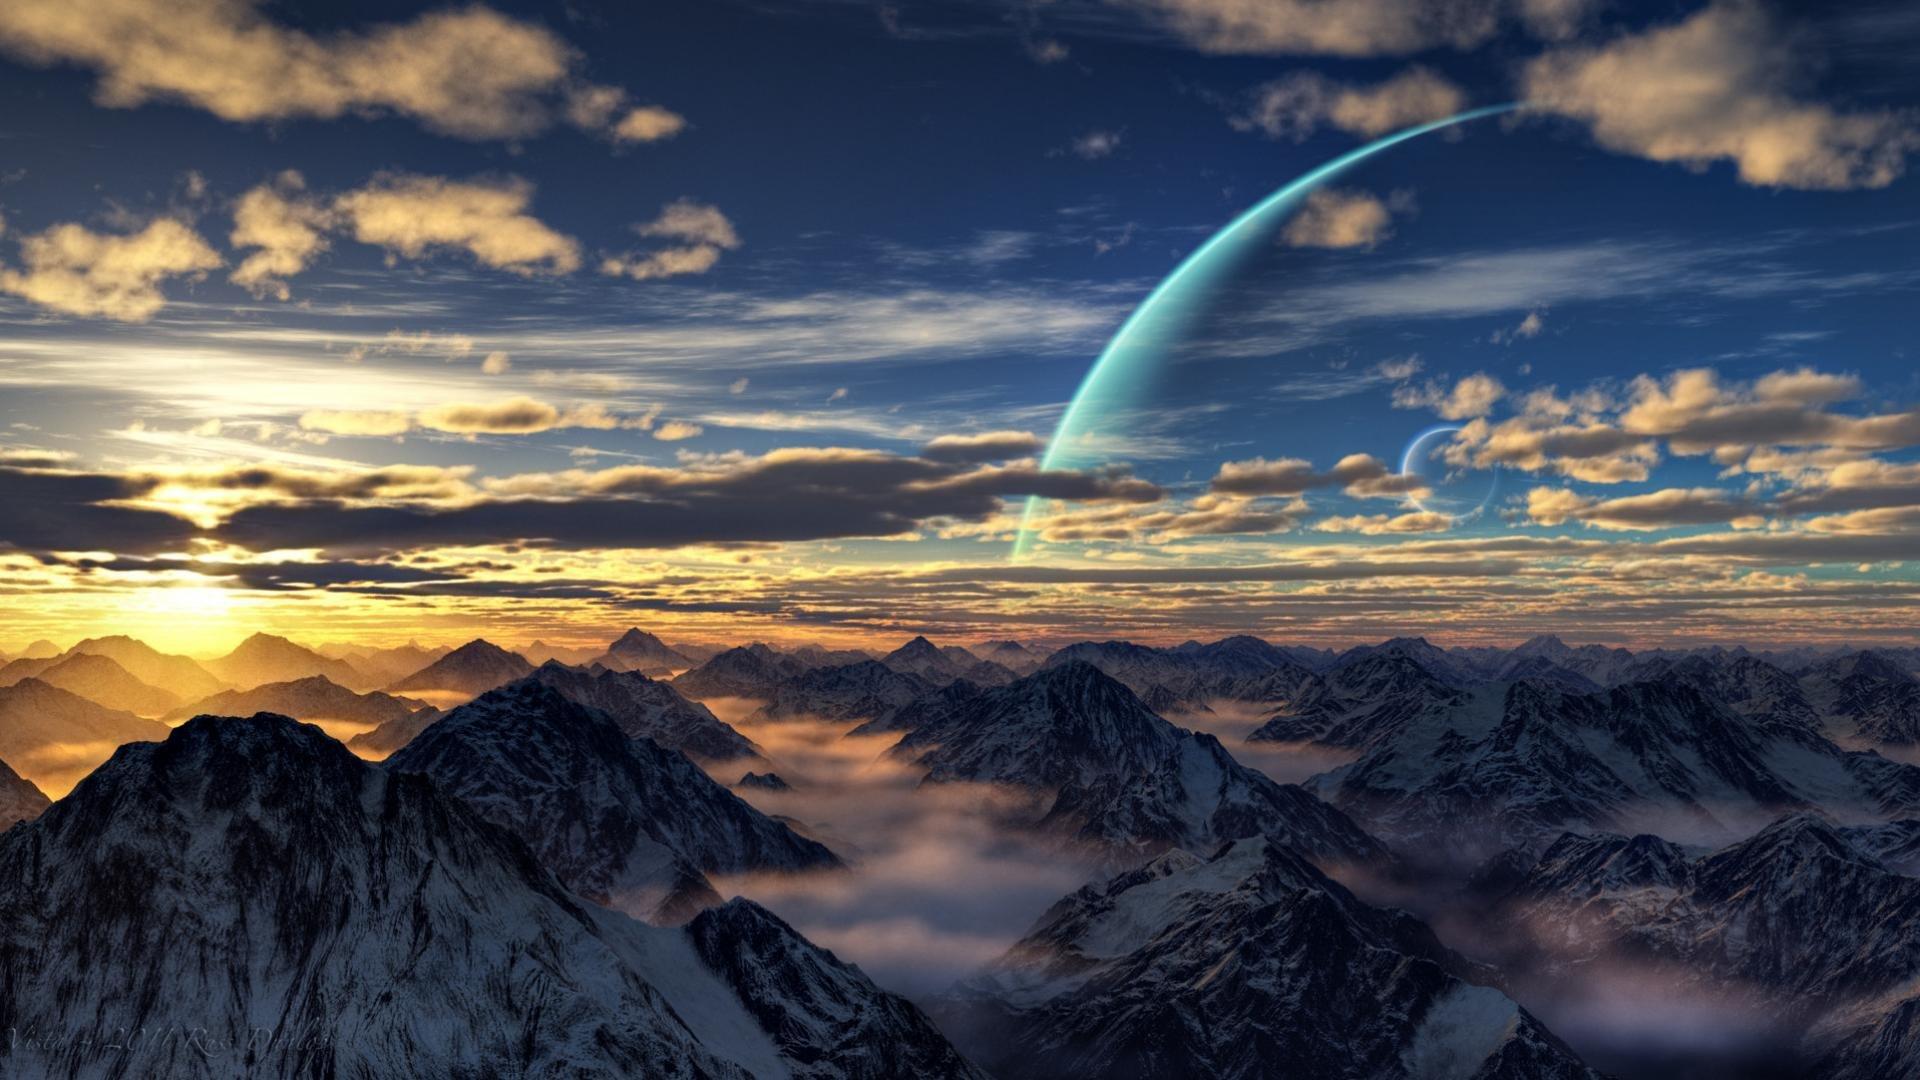 High Resolution Sci Fi Landscape Full Hd Wallpaper Id233160